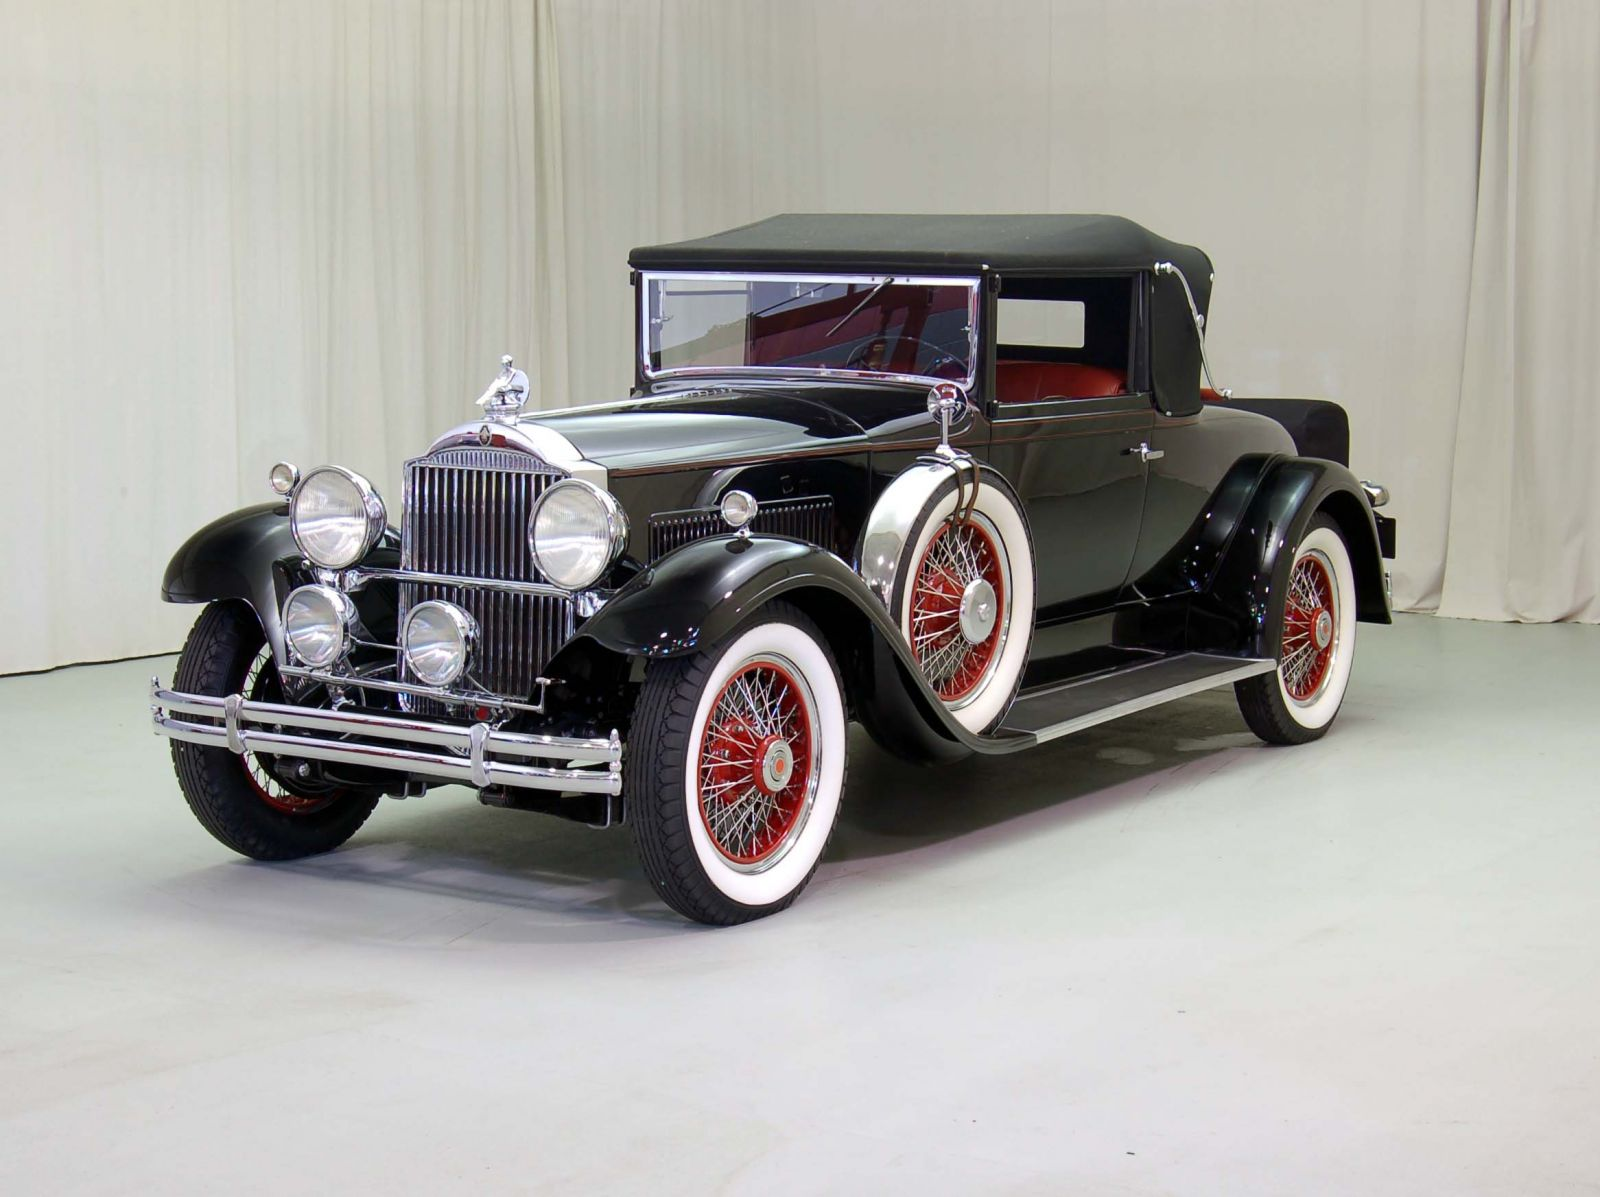 1930 Packard 733 Classic Car For Sale | Buy 1961 Renault Jolly Beach Car at Hyman LTD